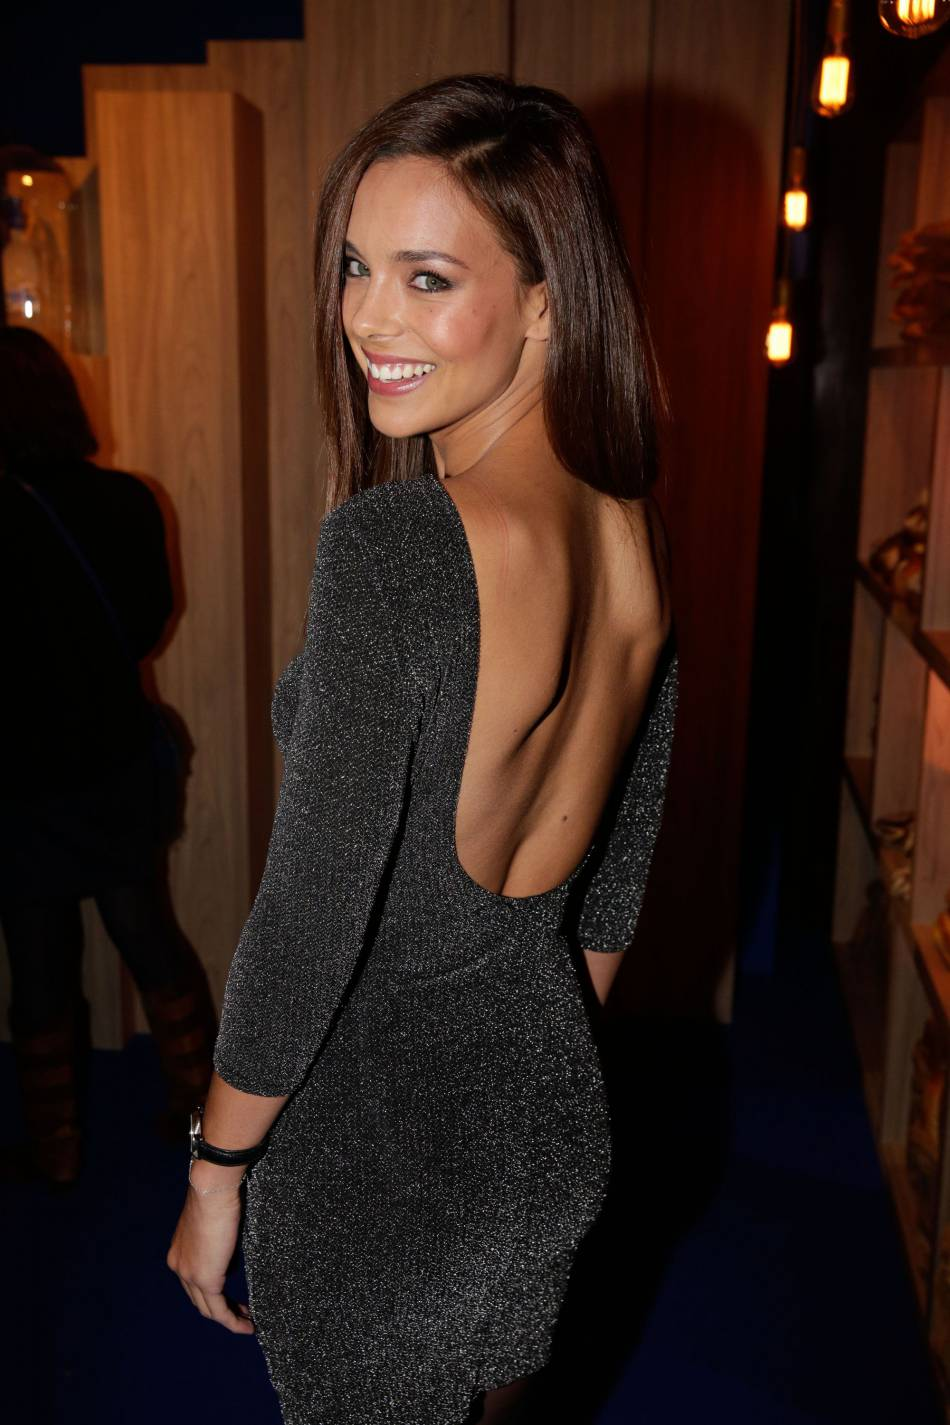 Marine Lorphelin, une Miss France très sexy.